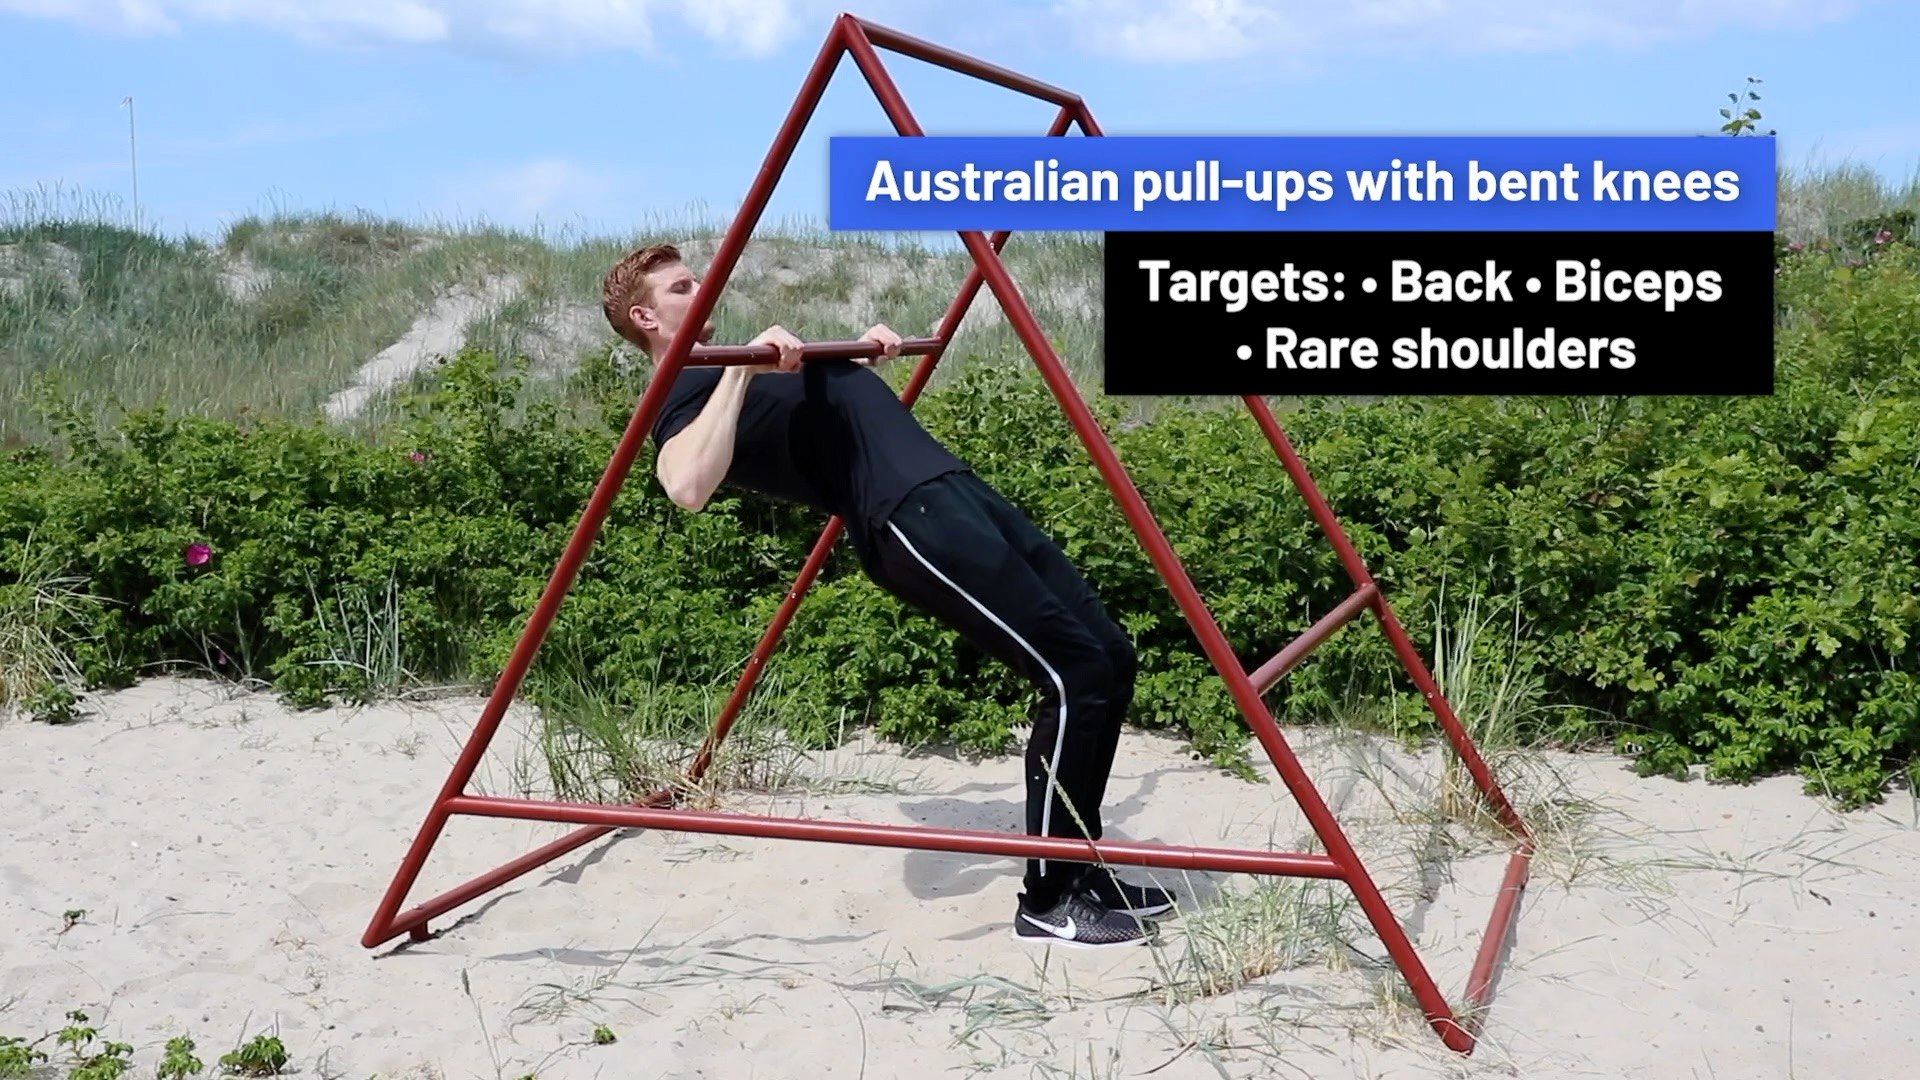 Australian pull-ups with bent knees